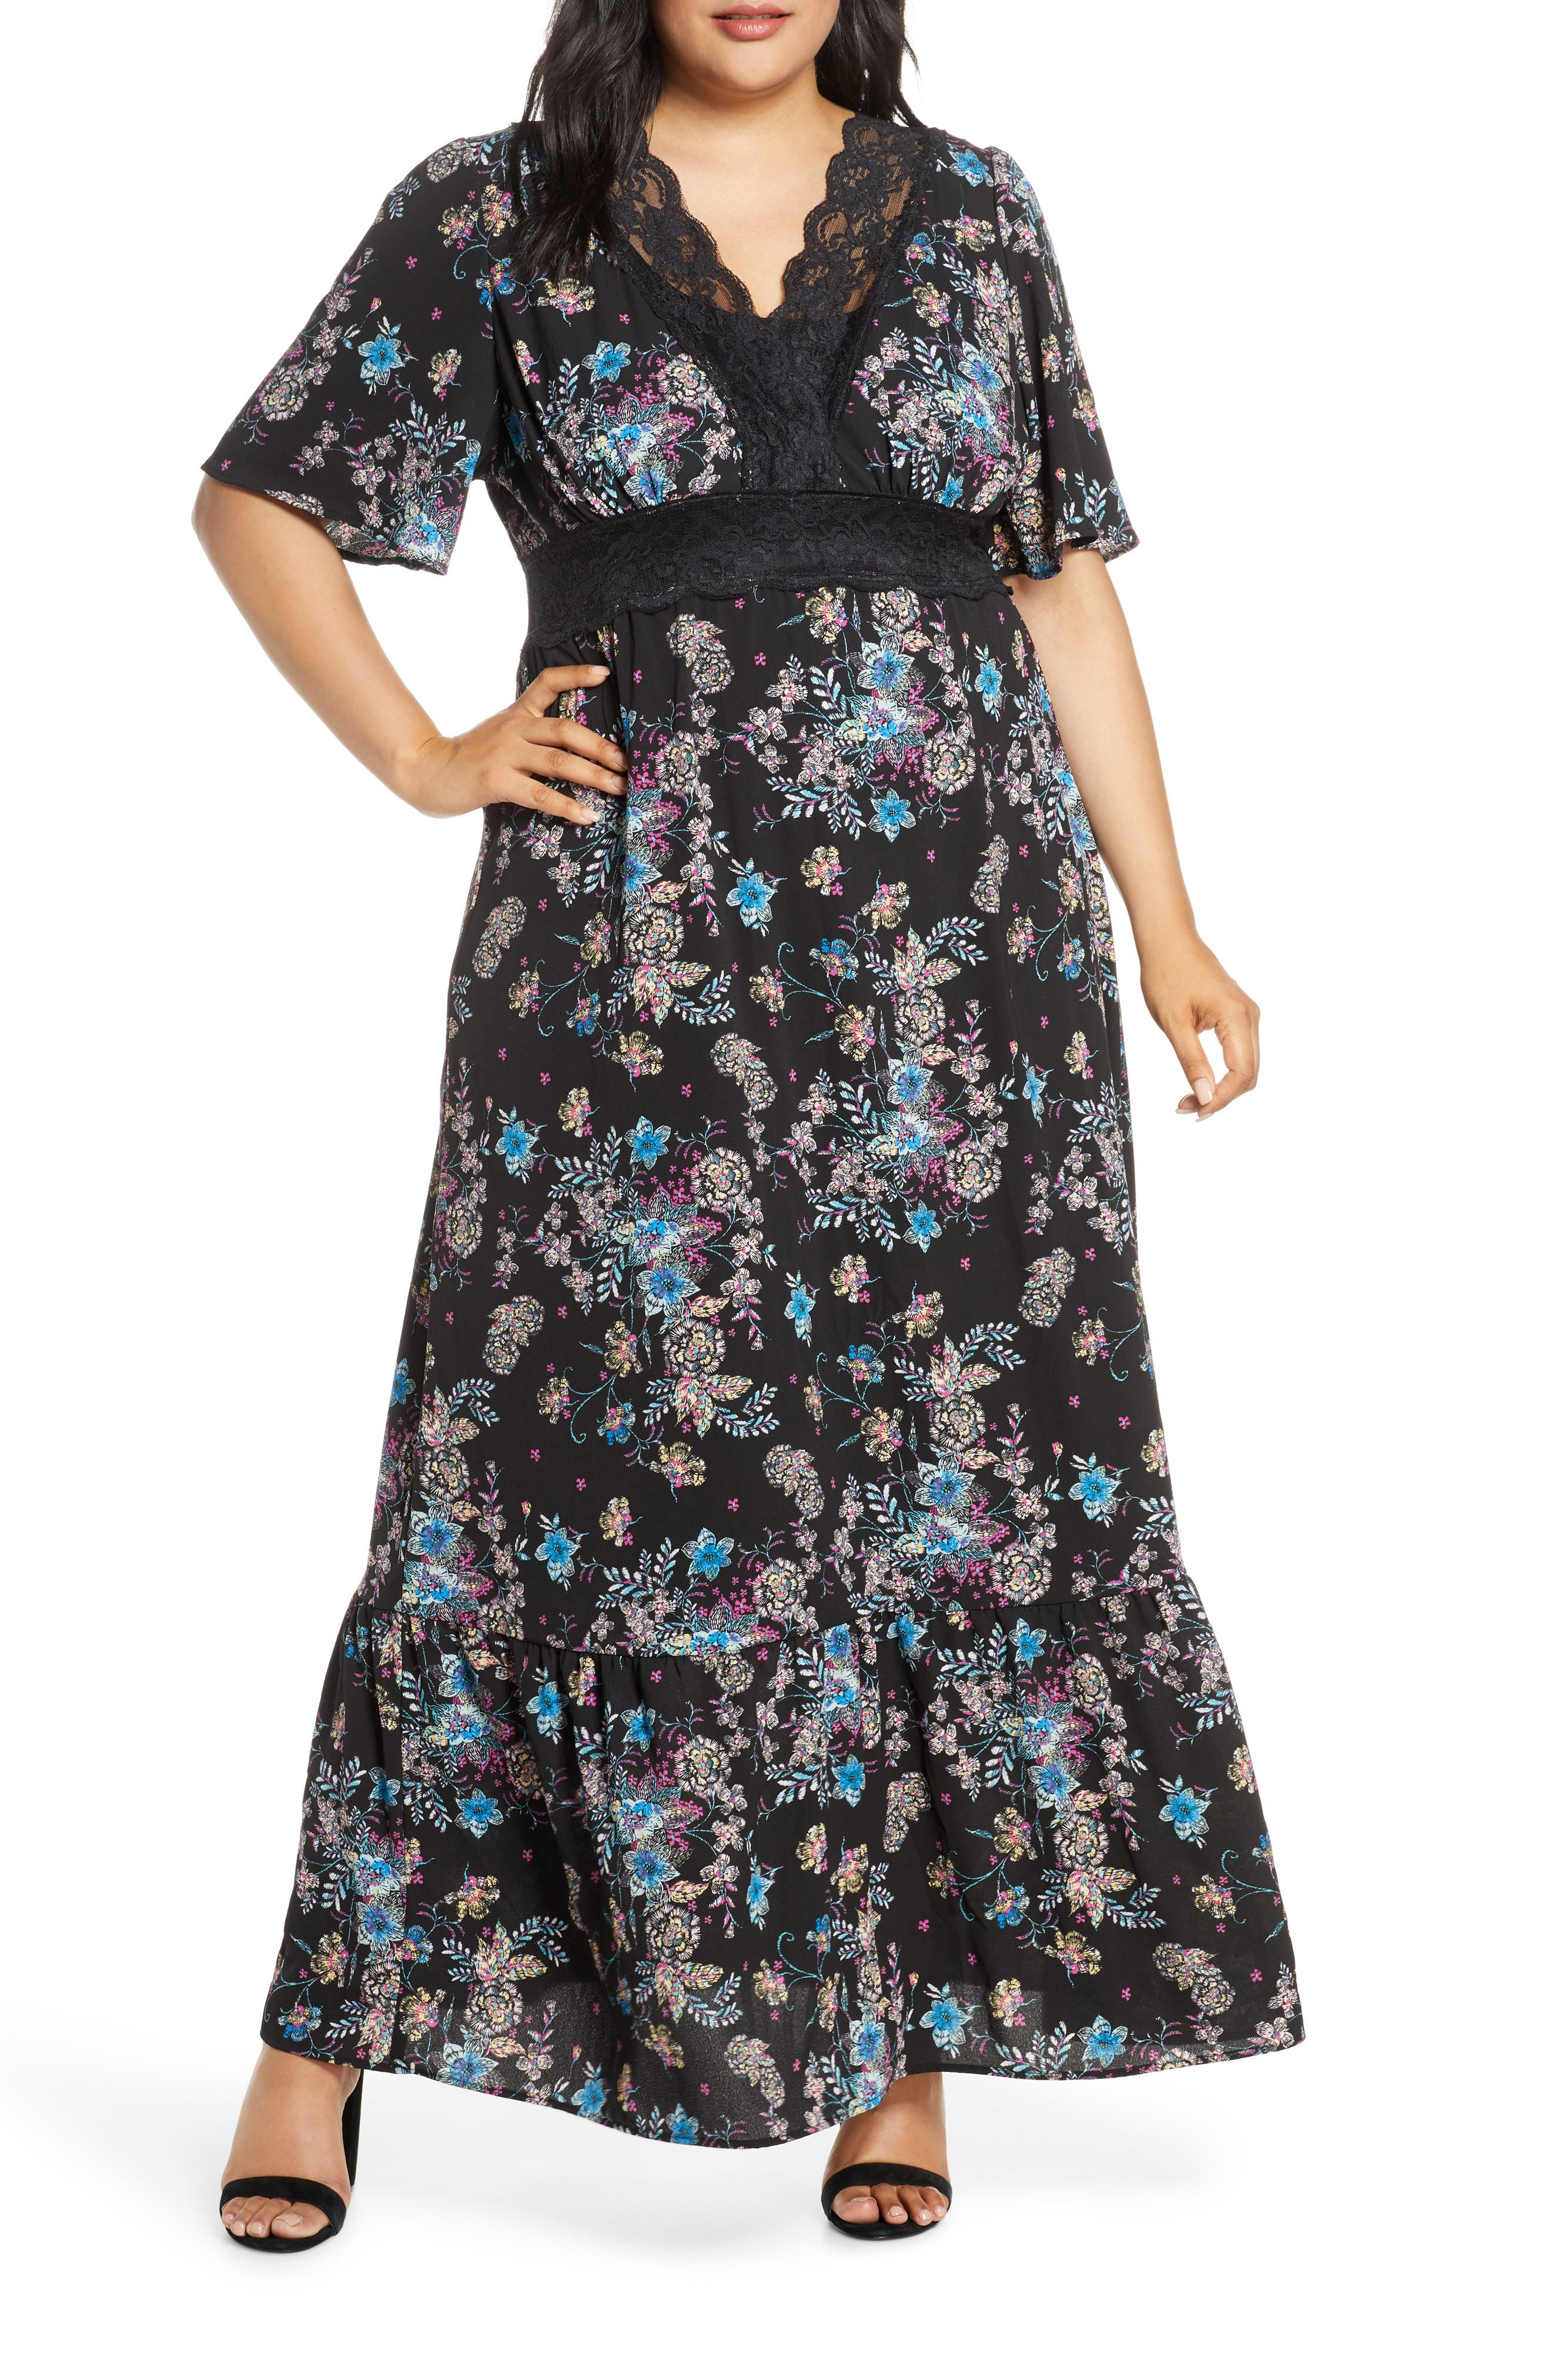 60s 70s Plus Size Dresses, Clothing, Costumes Plus Size Womens Kiyonna Daydream Maxi Dress Size 5X - Bluegreen $128.00 AT vintagedancer.com